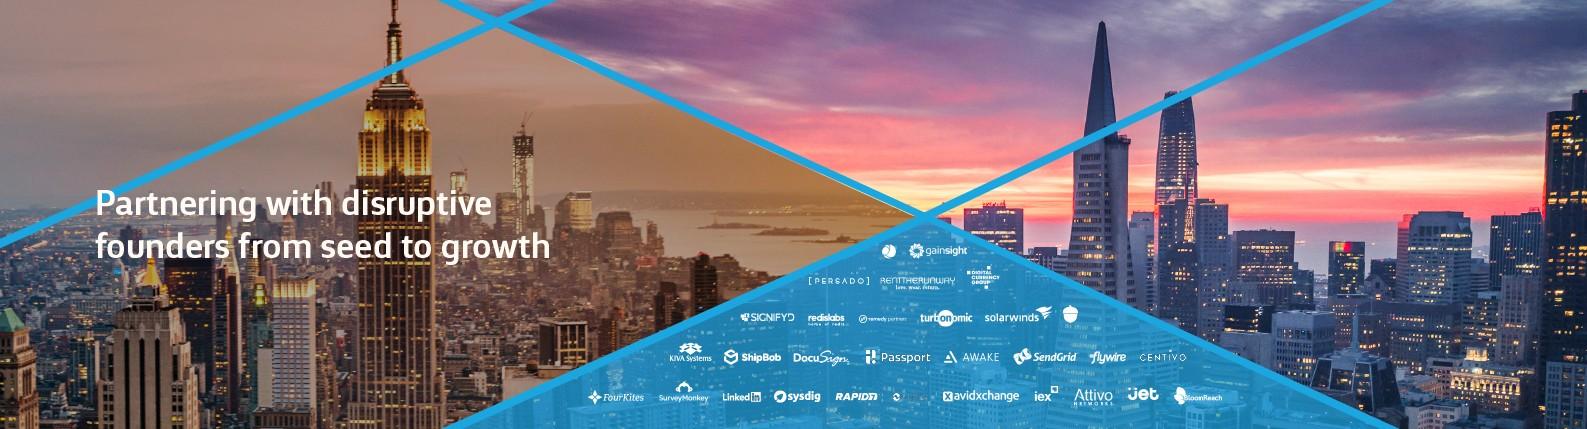 Bain Capital Ventures   LinkedIn